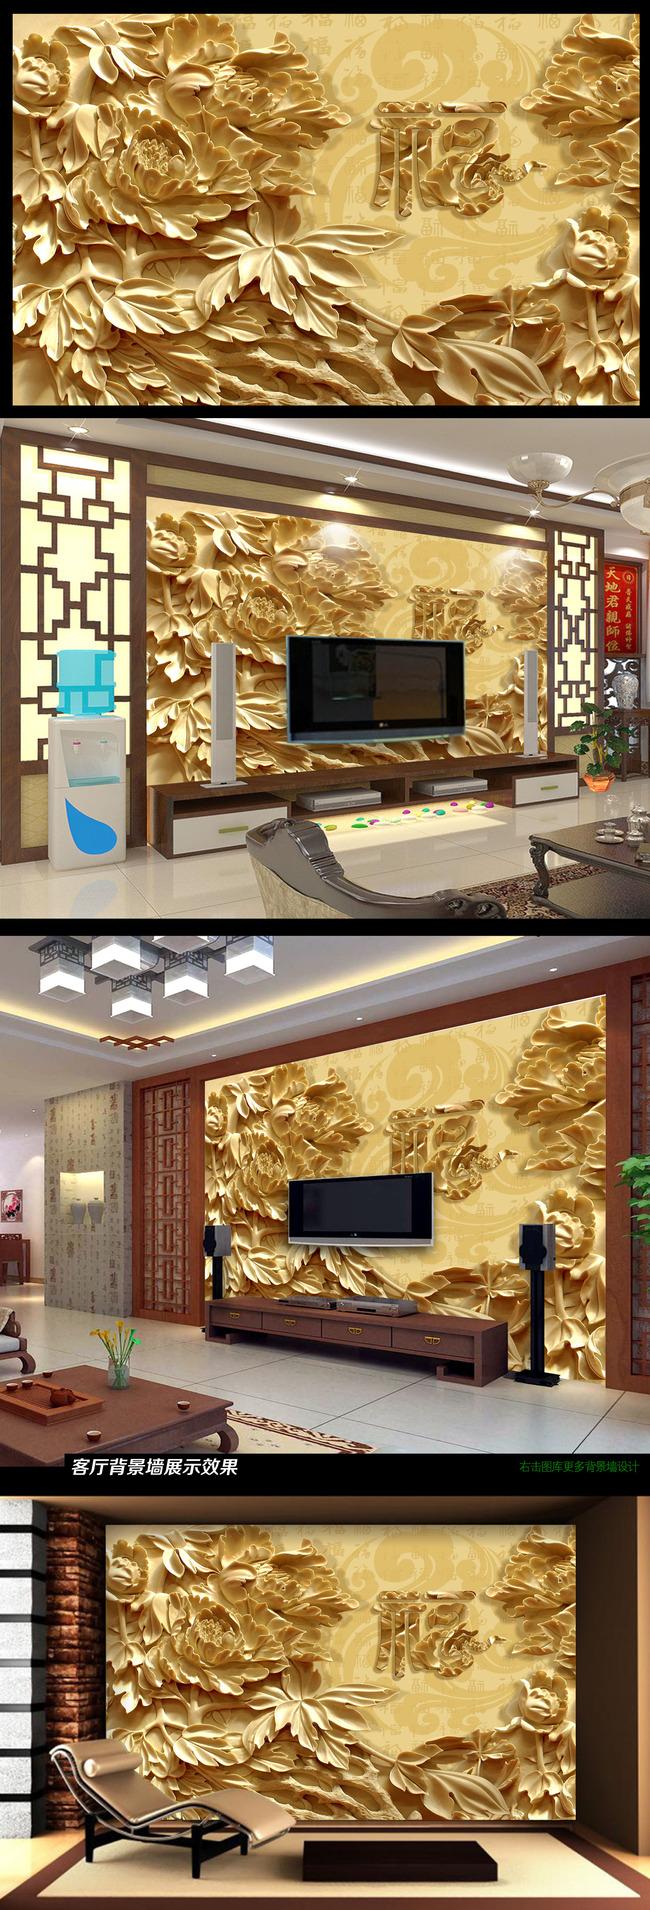 3d立体木雕牡丹花客厅背景墙